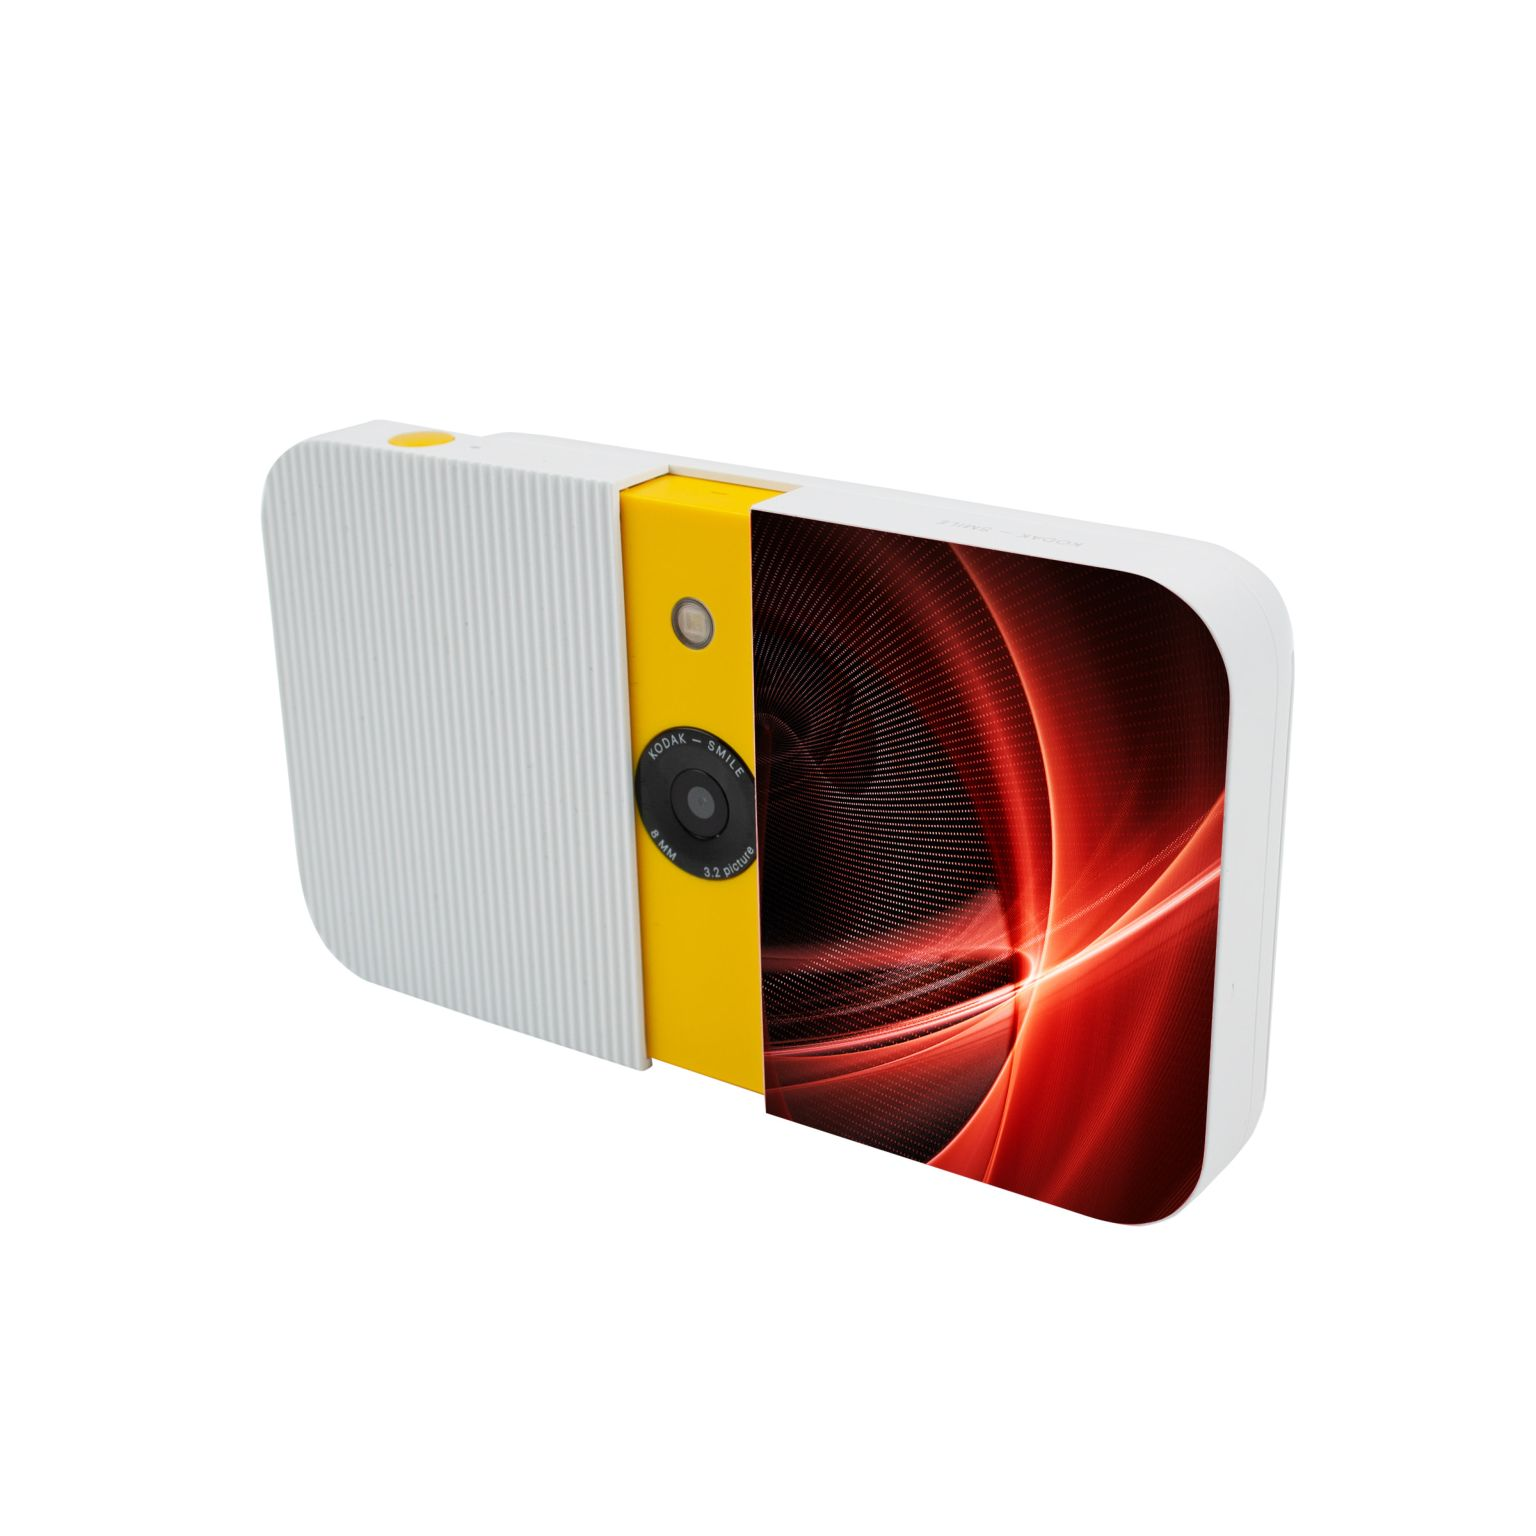 Kodak Smile Instant Print Digital Camera Max Print Blanc avec impression quadri